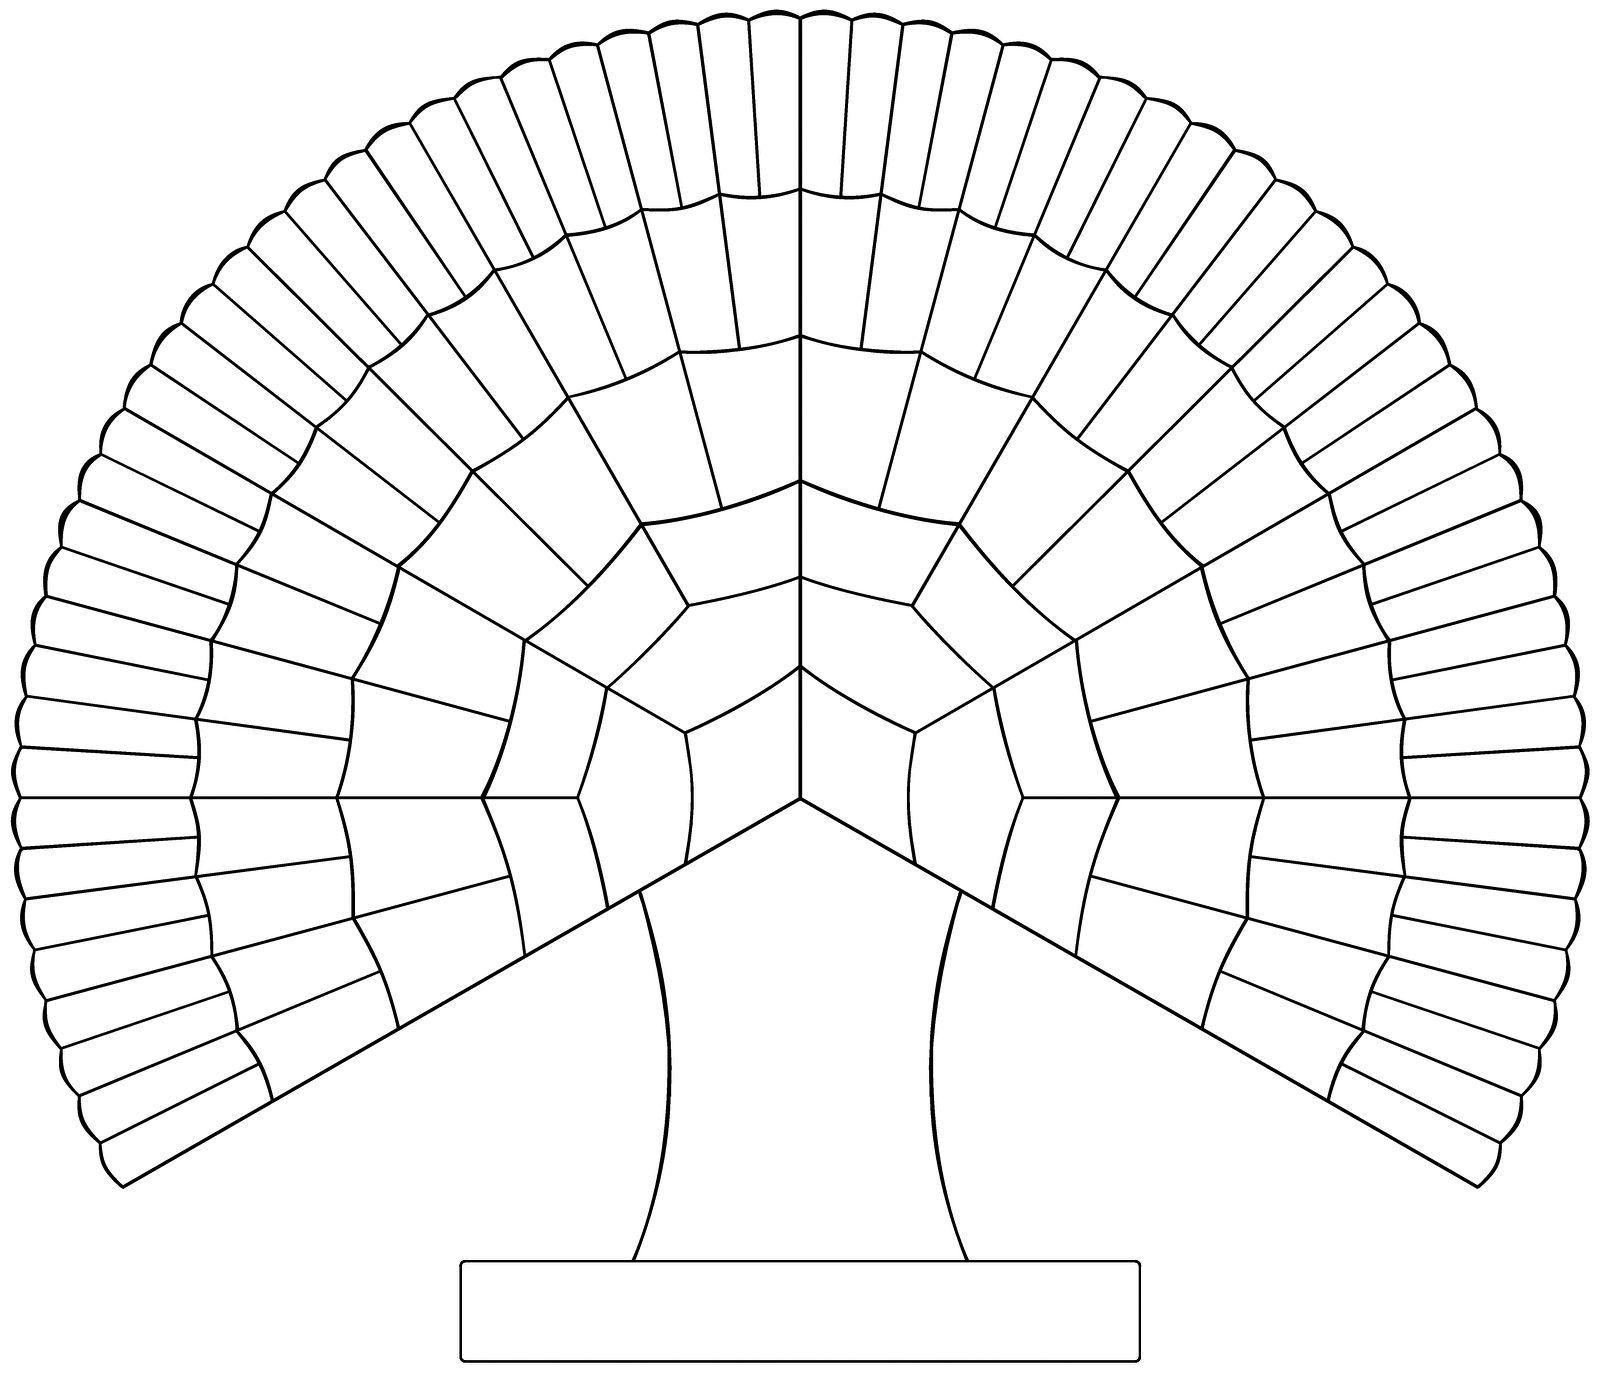 генеалогическое древо схема Razukrashkicom Lines